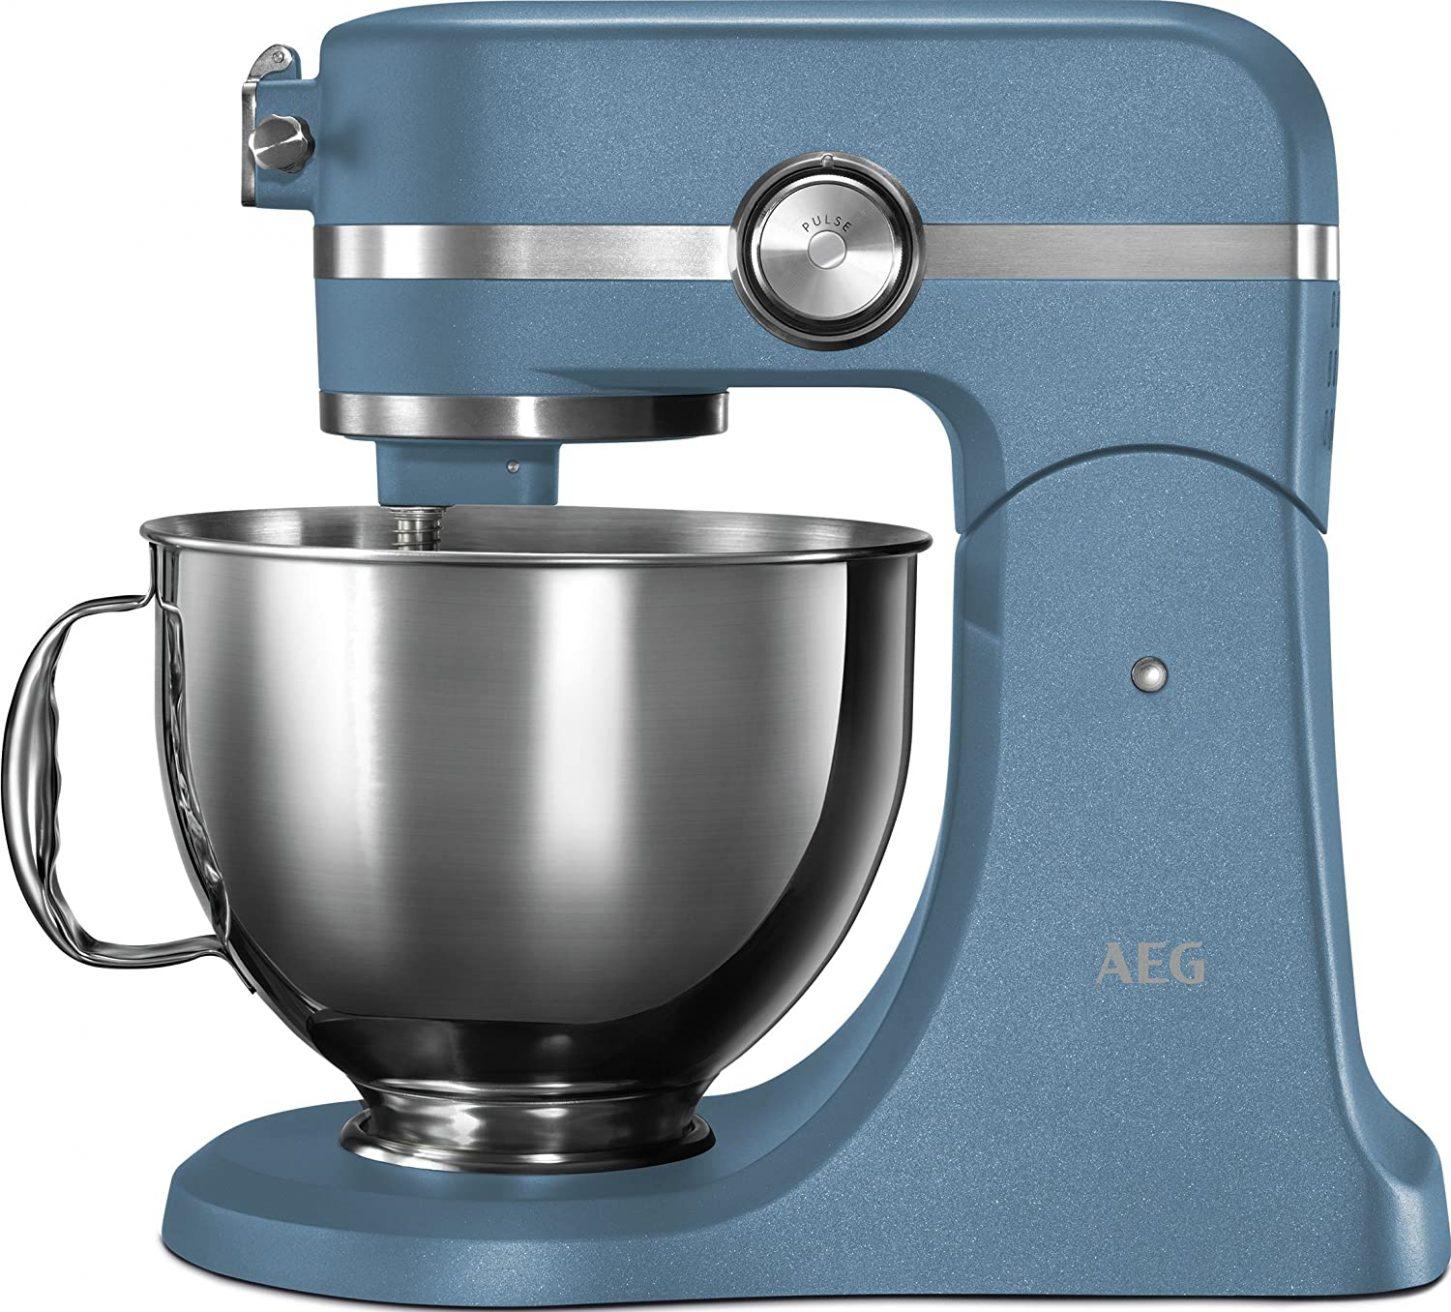 AEG KM5560-U UltraMix Stand Mixer - Sterling Blue